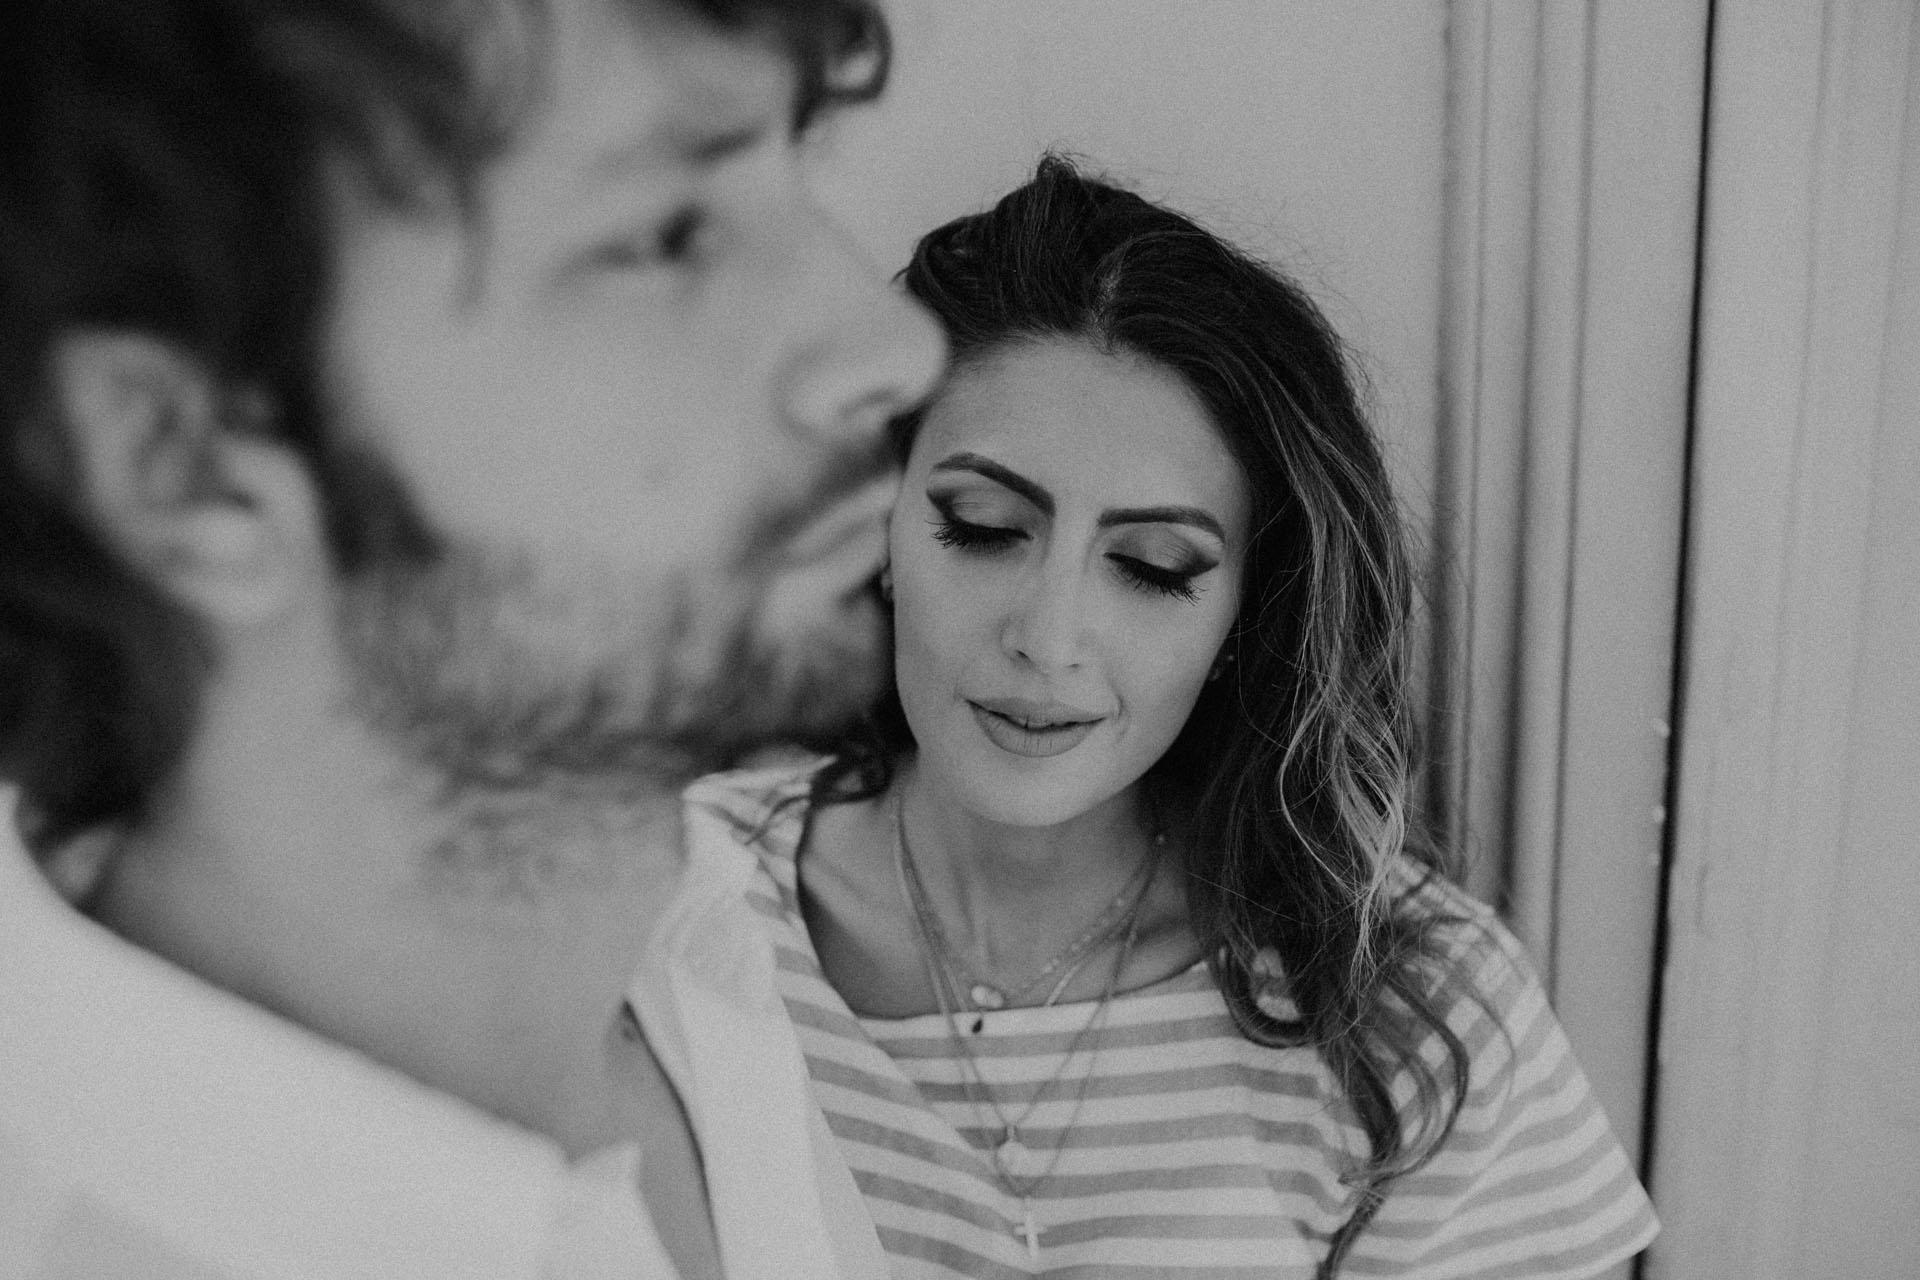 coupleshooting-roma-hochzeitsfotografen-wien-agnesundandi-3